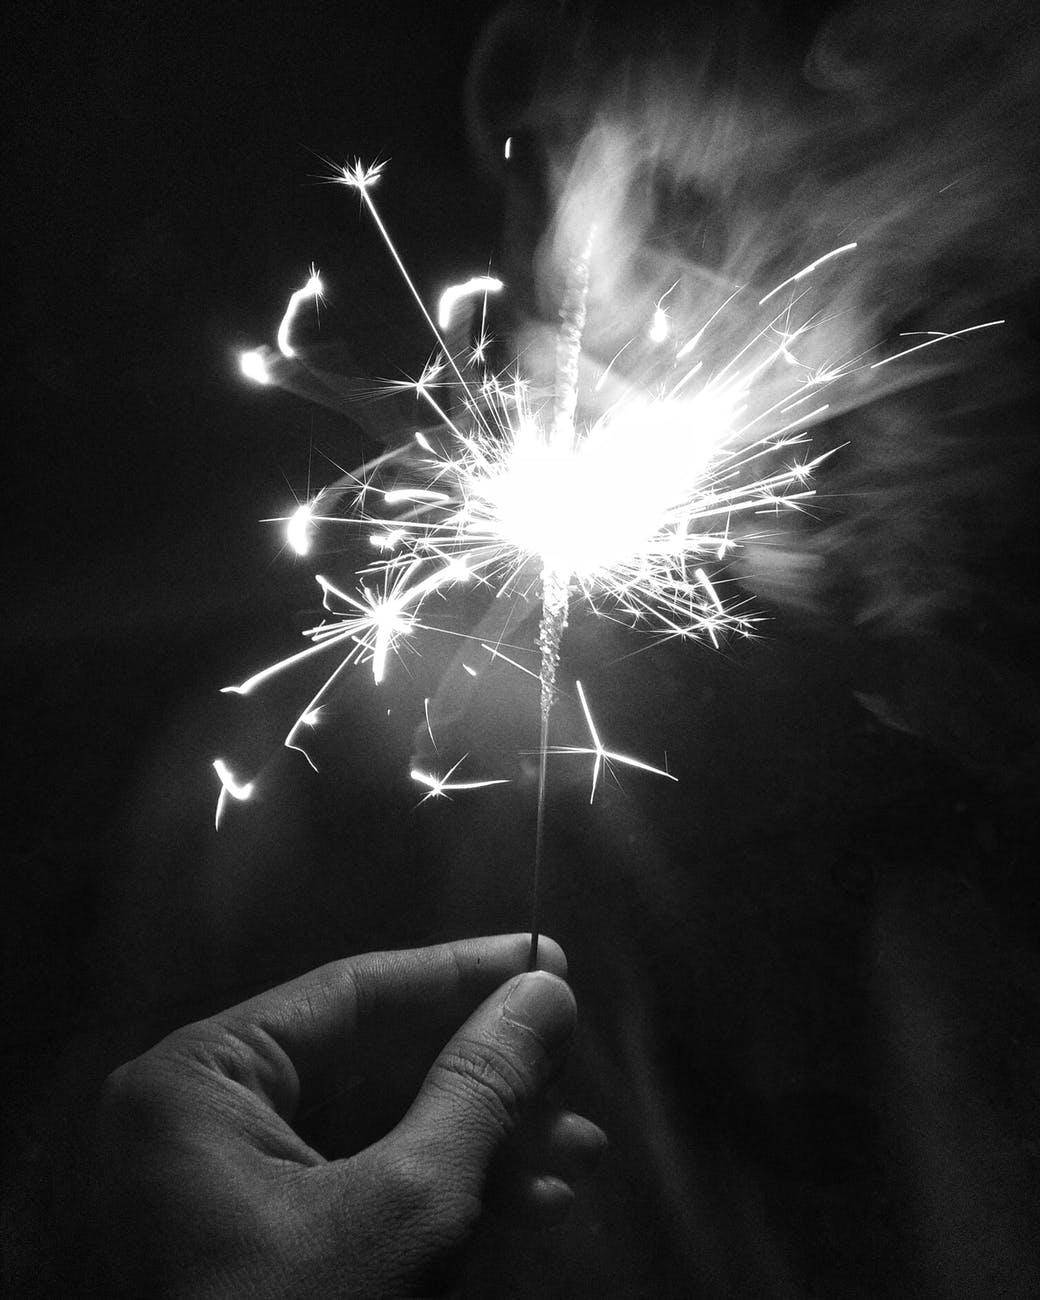 monochrome photo of person holding sparkler